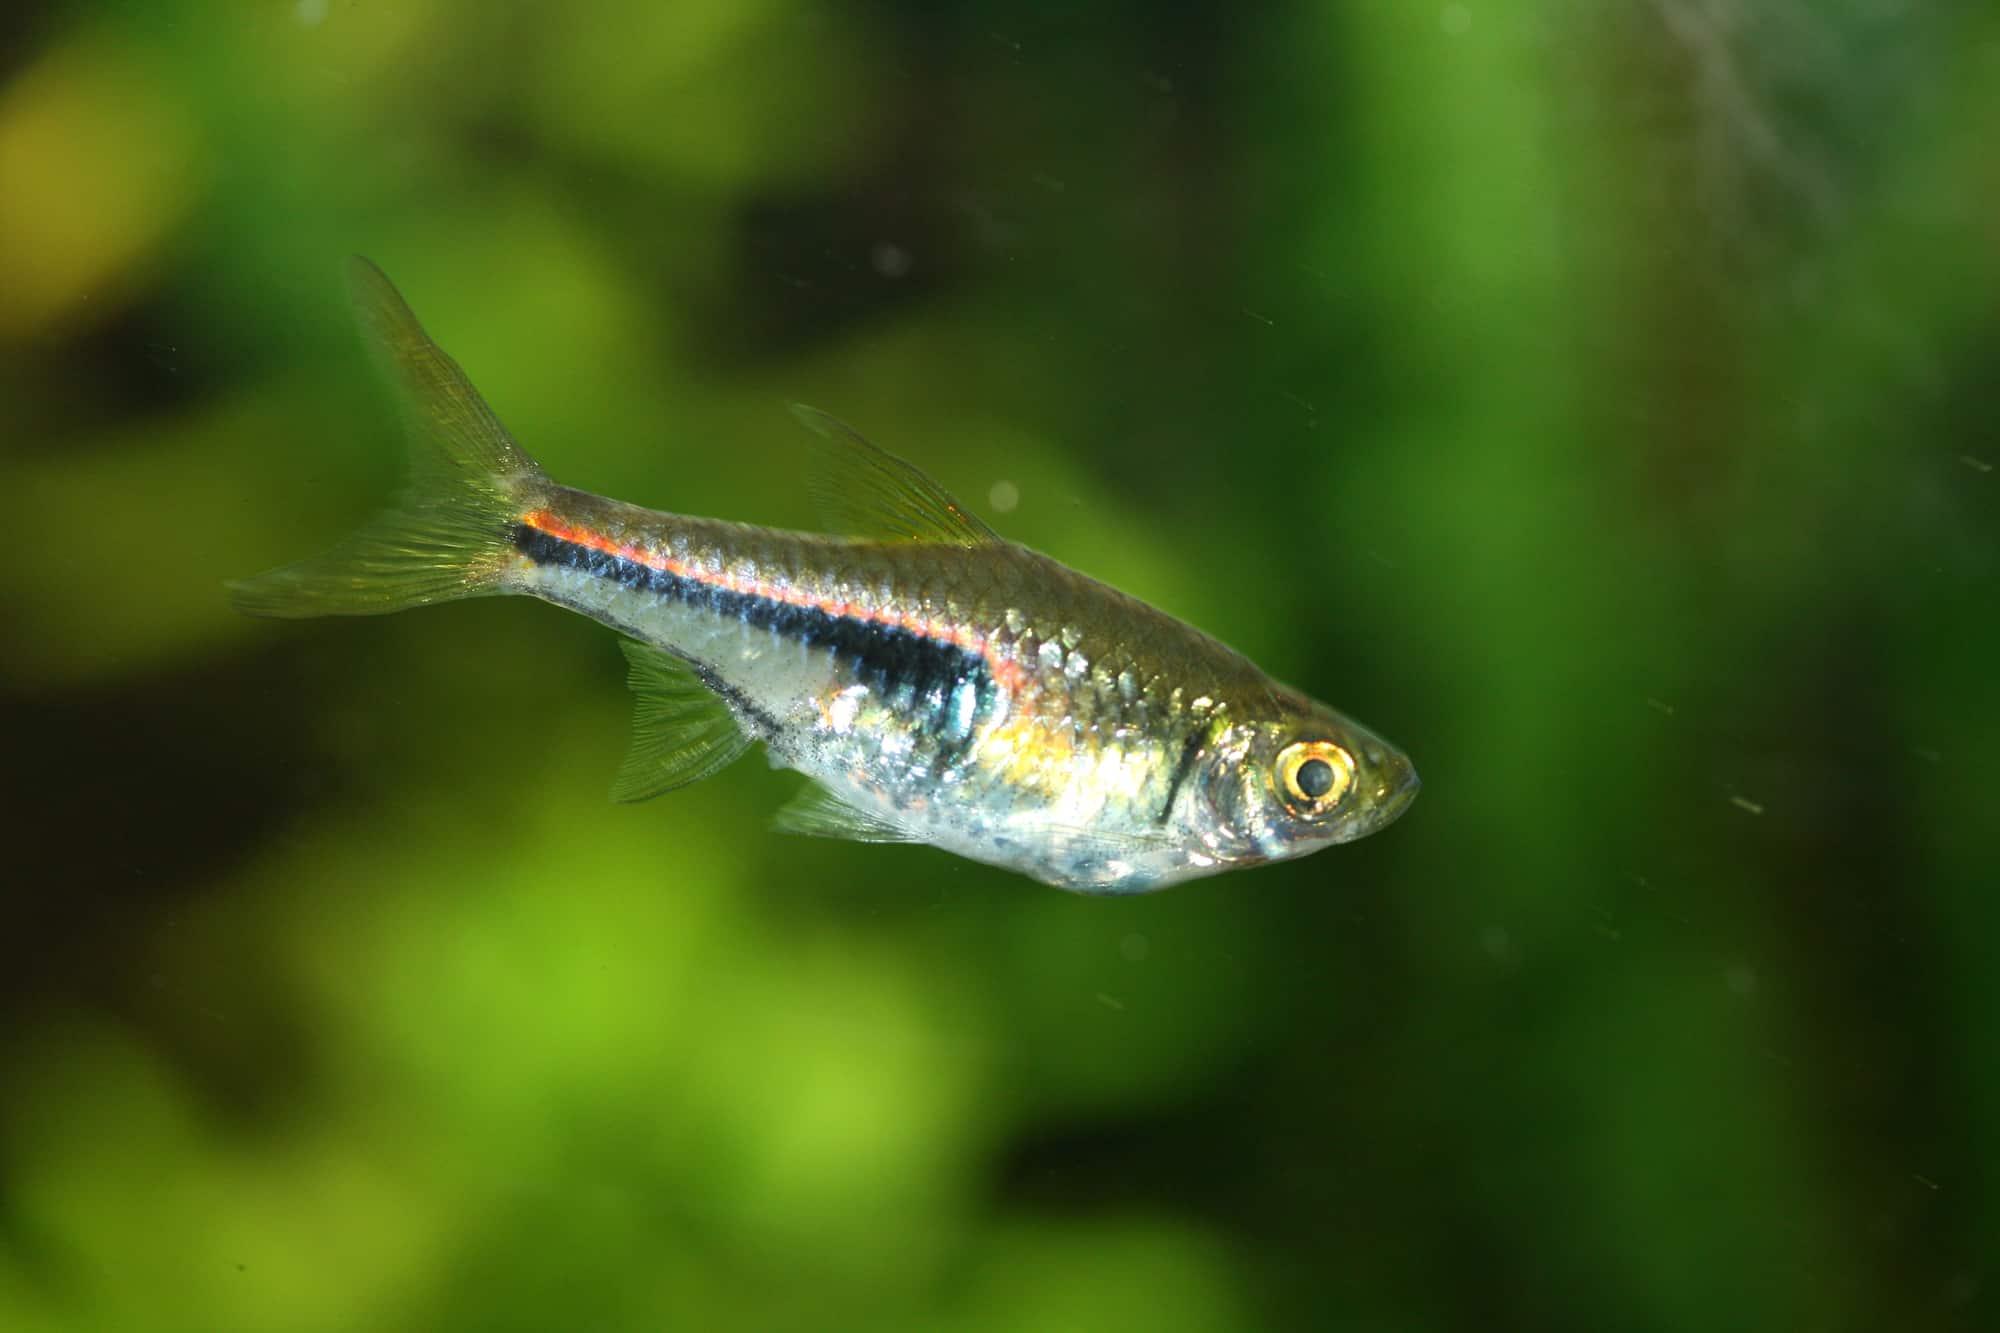 The Harlequin Rasbora (Rasbora heteromorpha) a popular freshwater aquarium fish Der Keilfleckbärbling (Rasbora heteromorpha) ein beliebter Süßwasser-Aquarienfisch